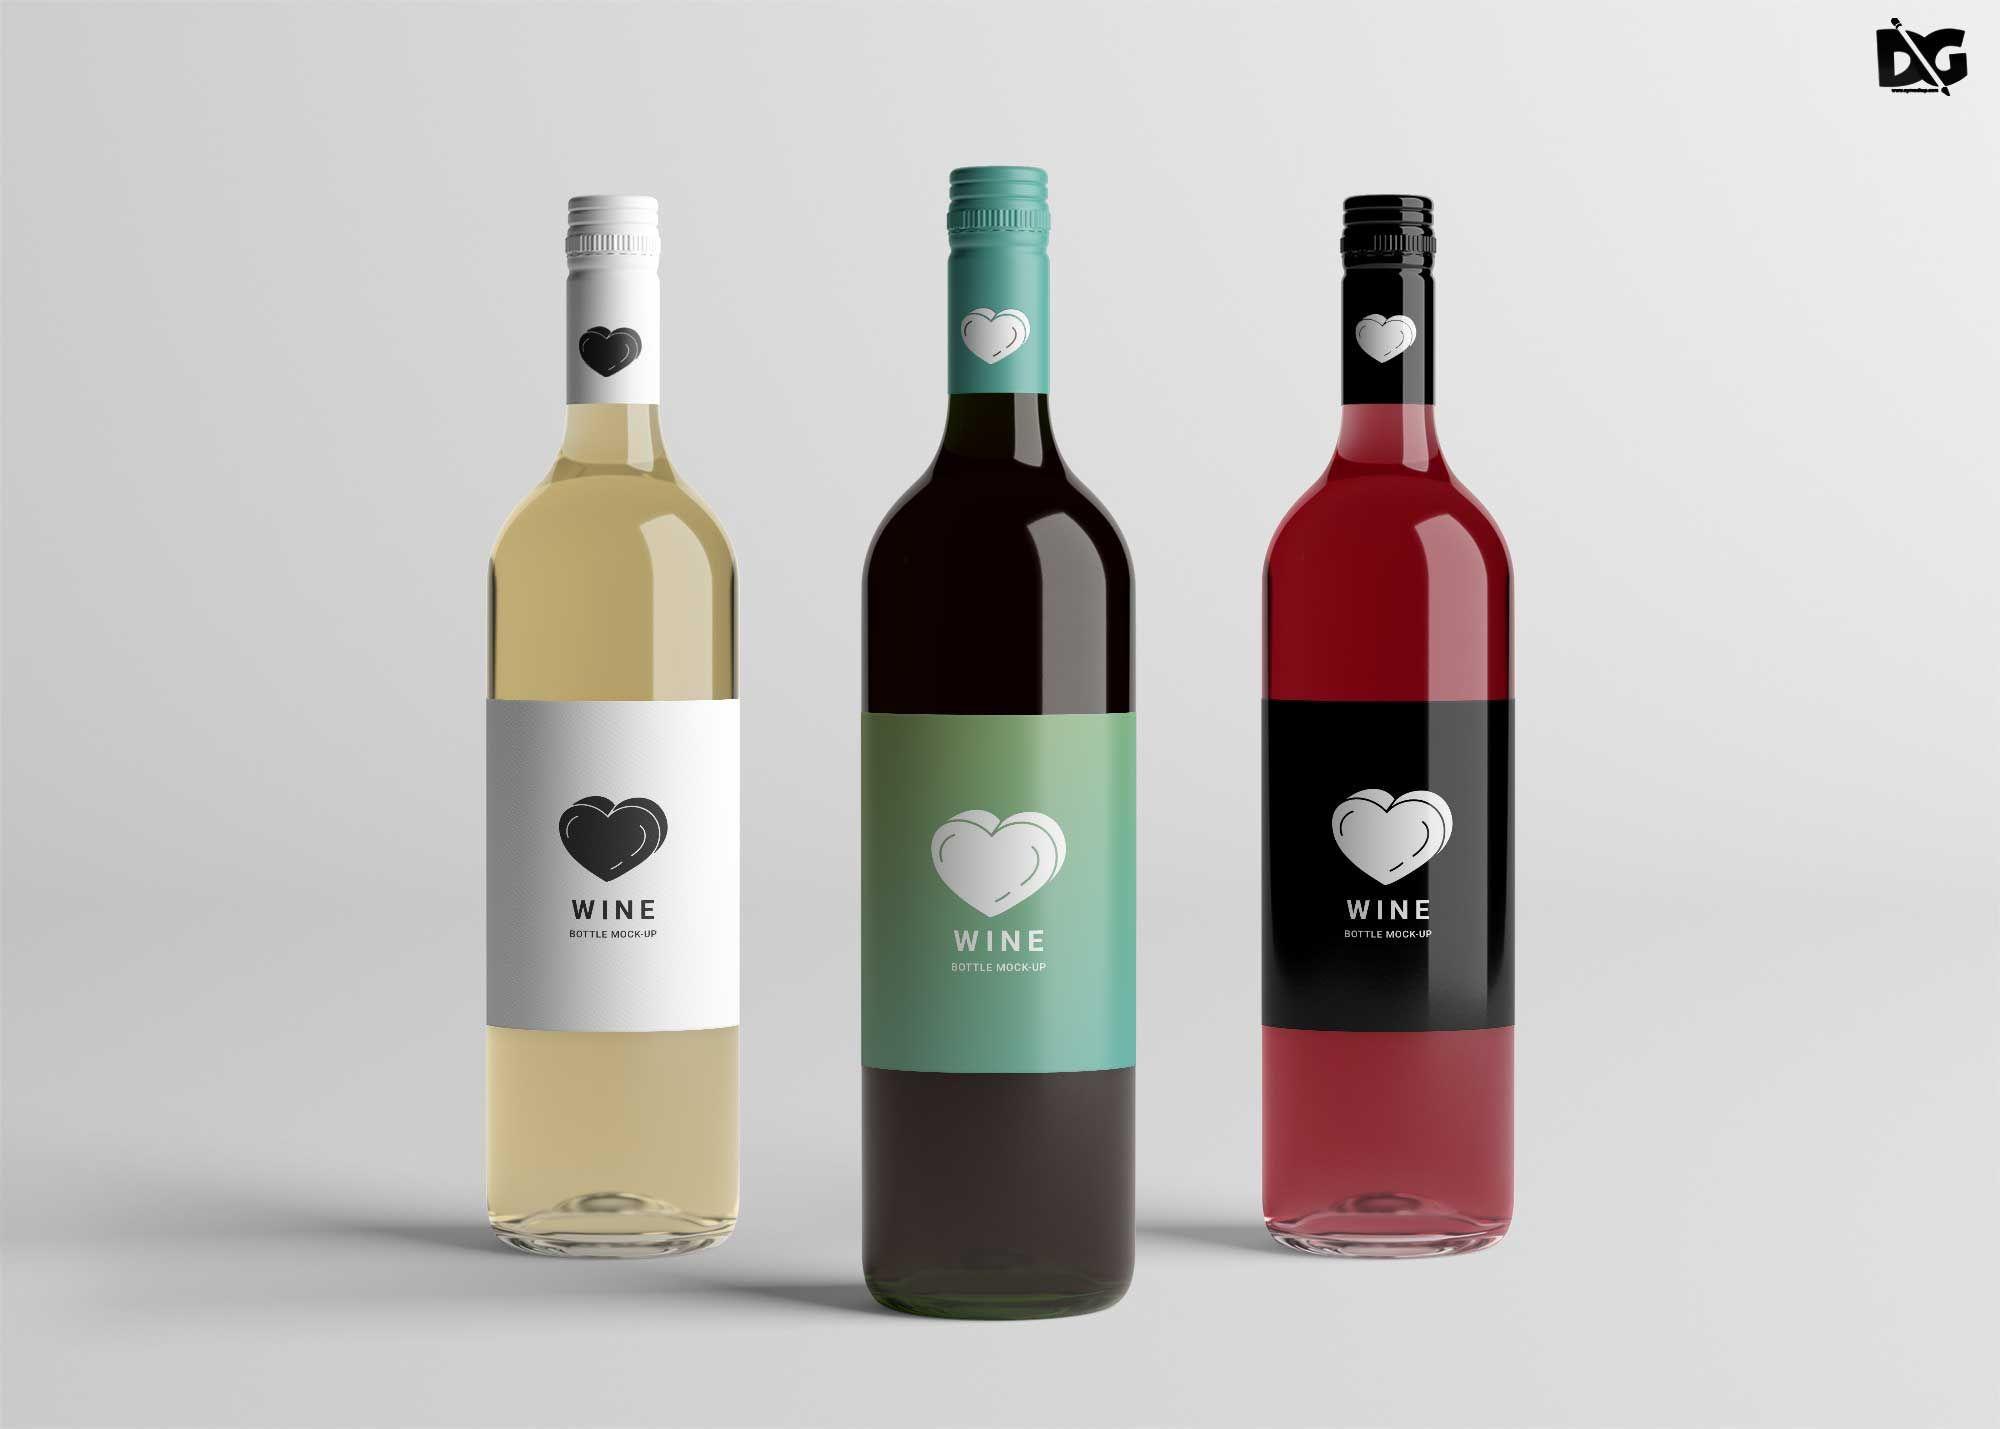 002 Surprising Free Wine Bottle Label Template Highest Clarity  Mini PrintableFull